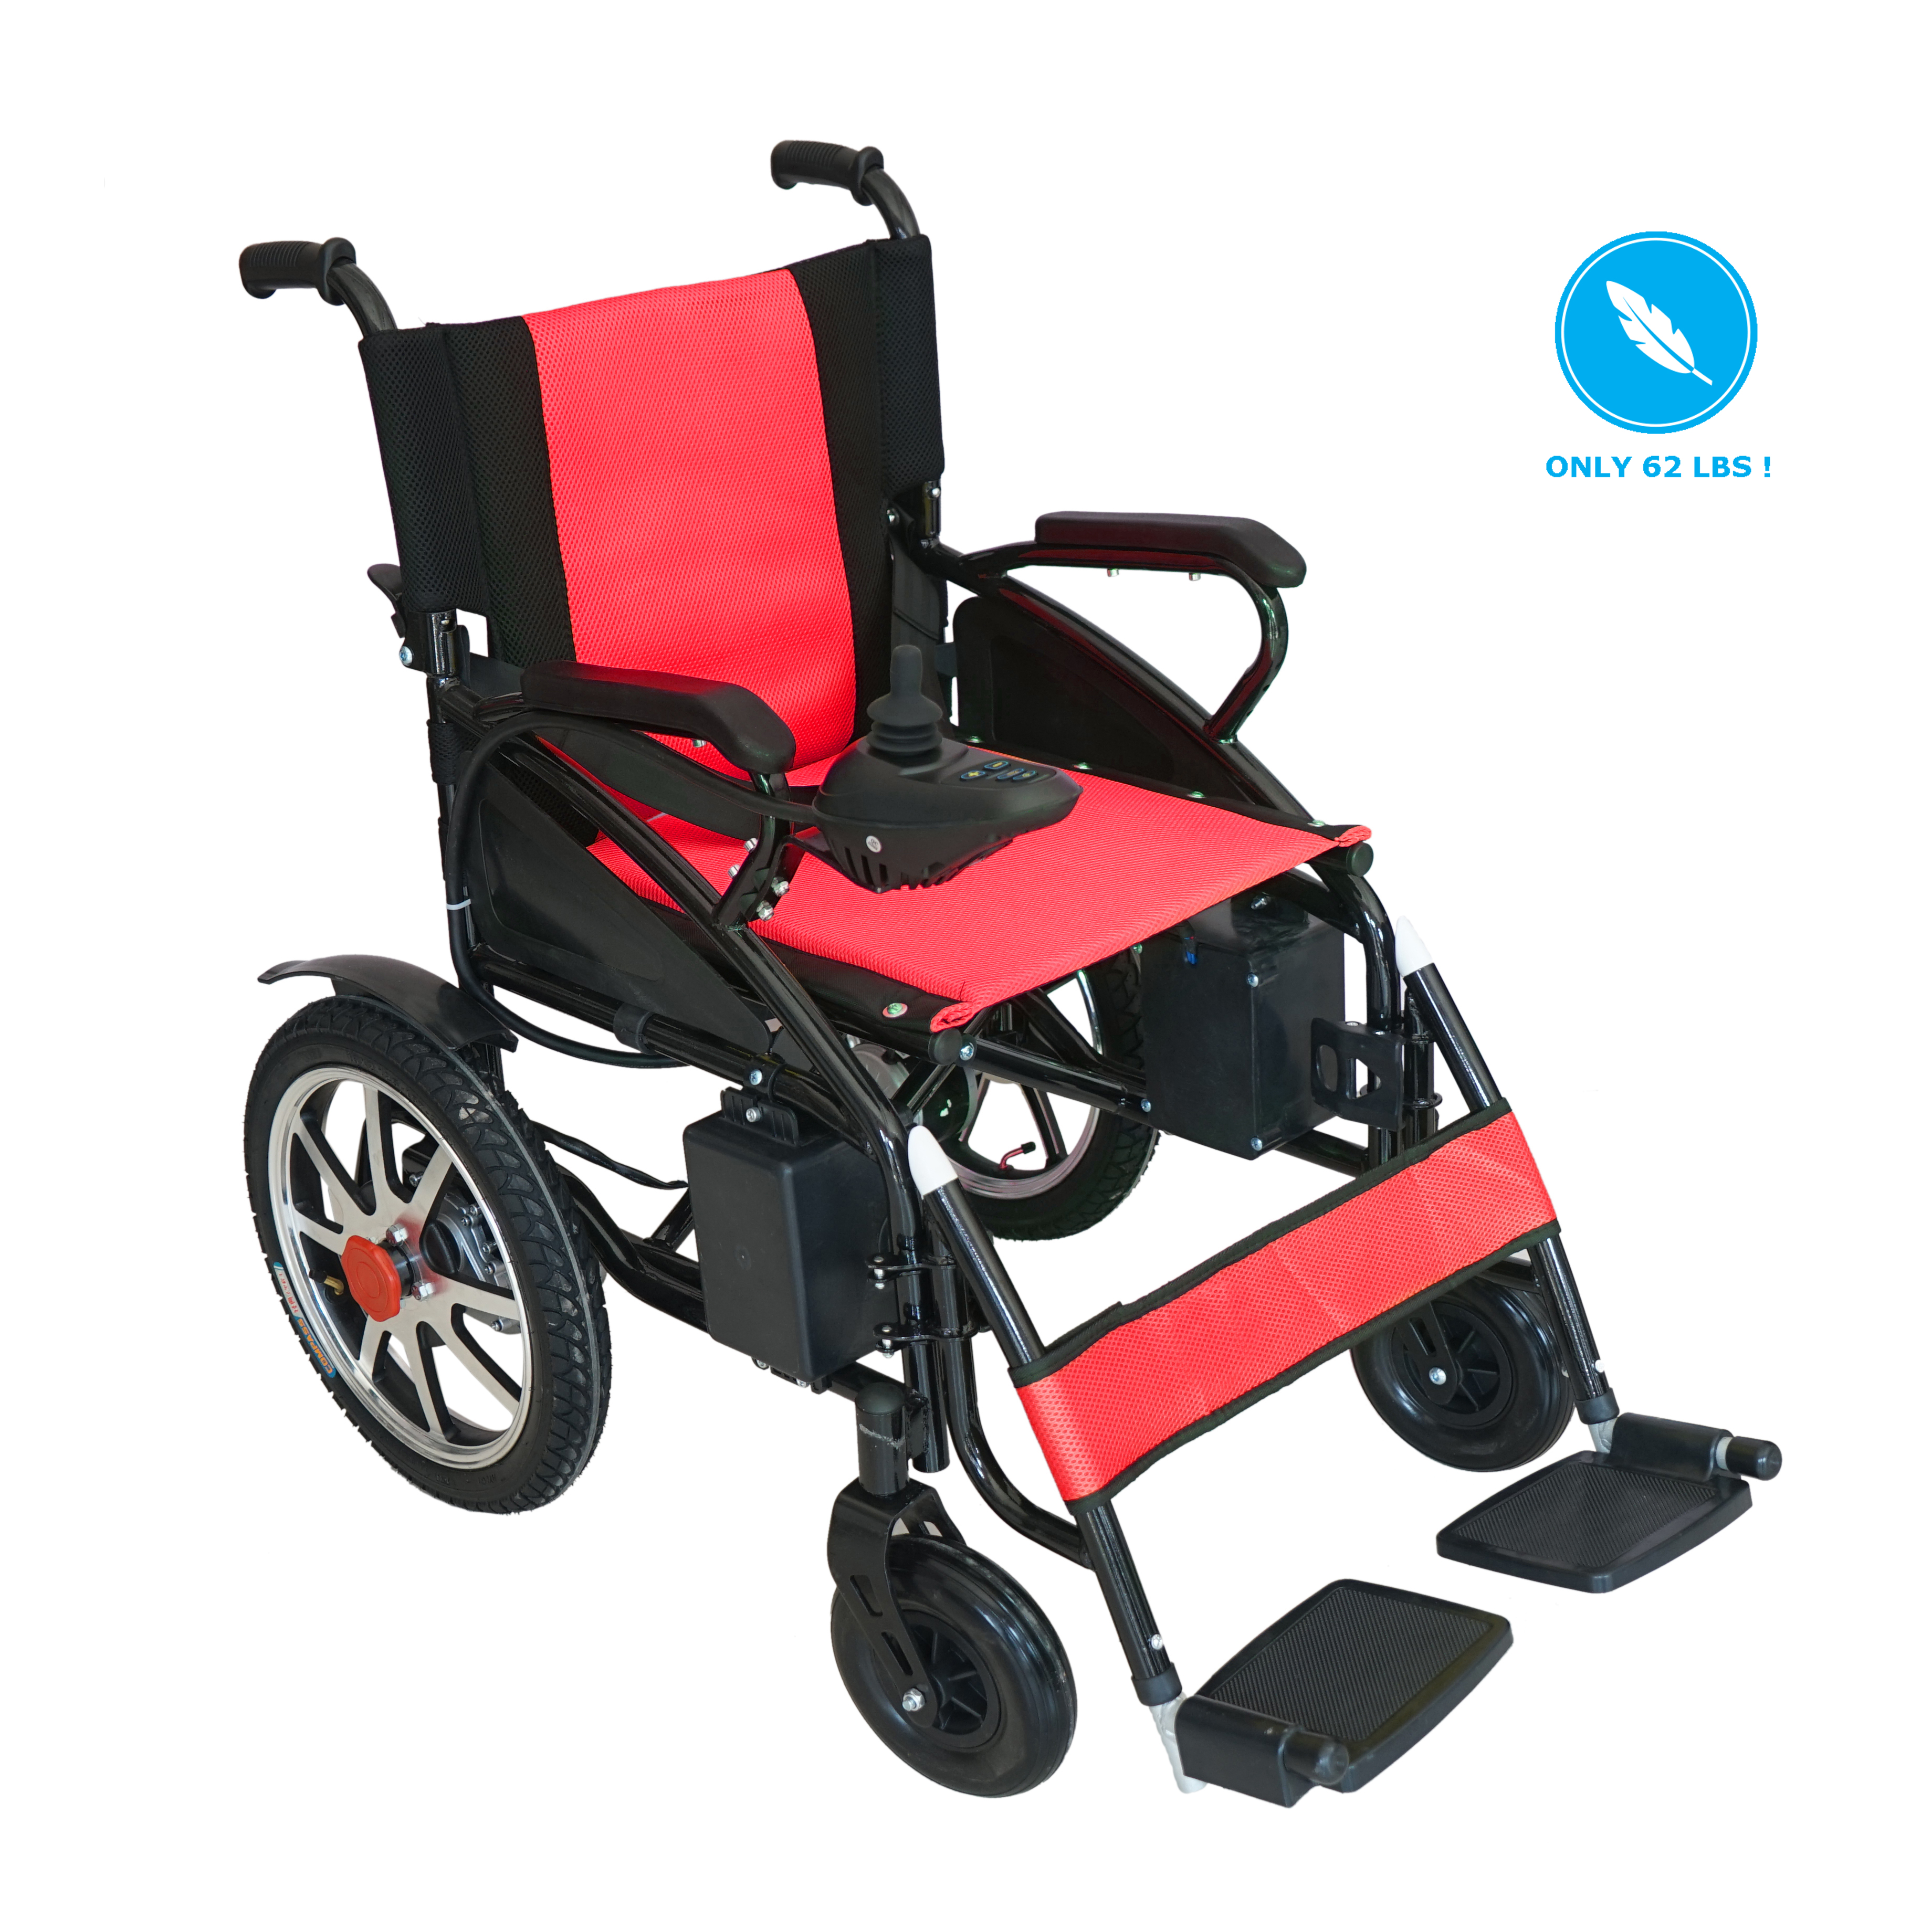 Electric Wheelchair Foldable Lightweight Heavy Duty Lithium Battery Electric Power Wheel chair Multi Terrain Easy Travel